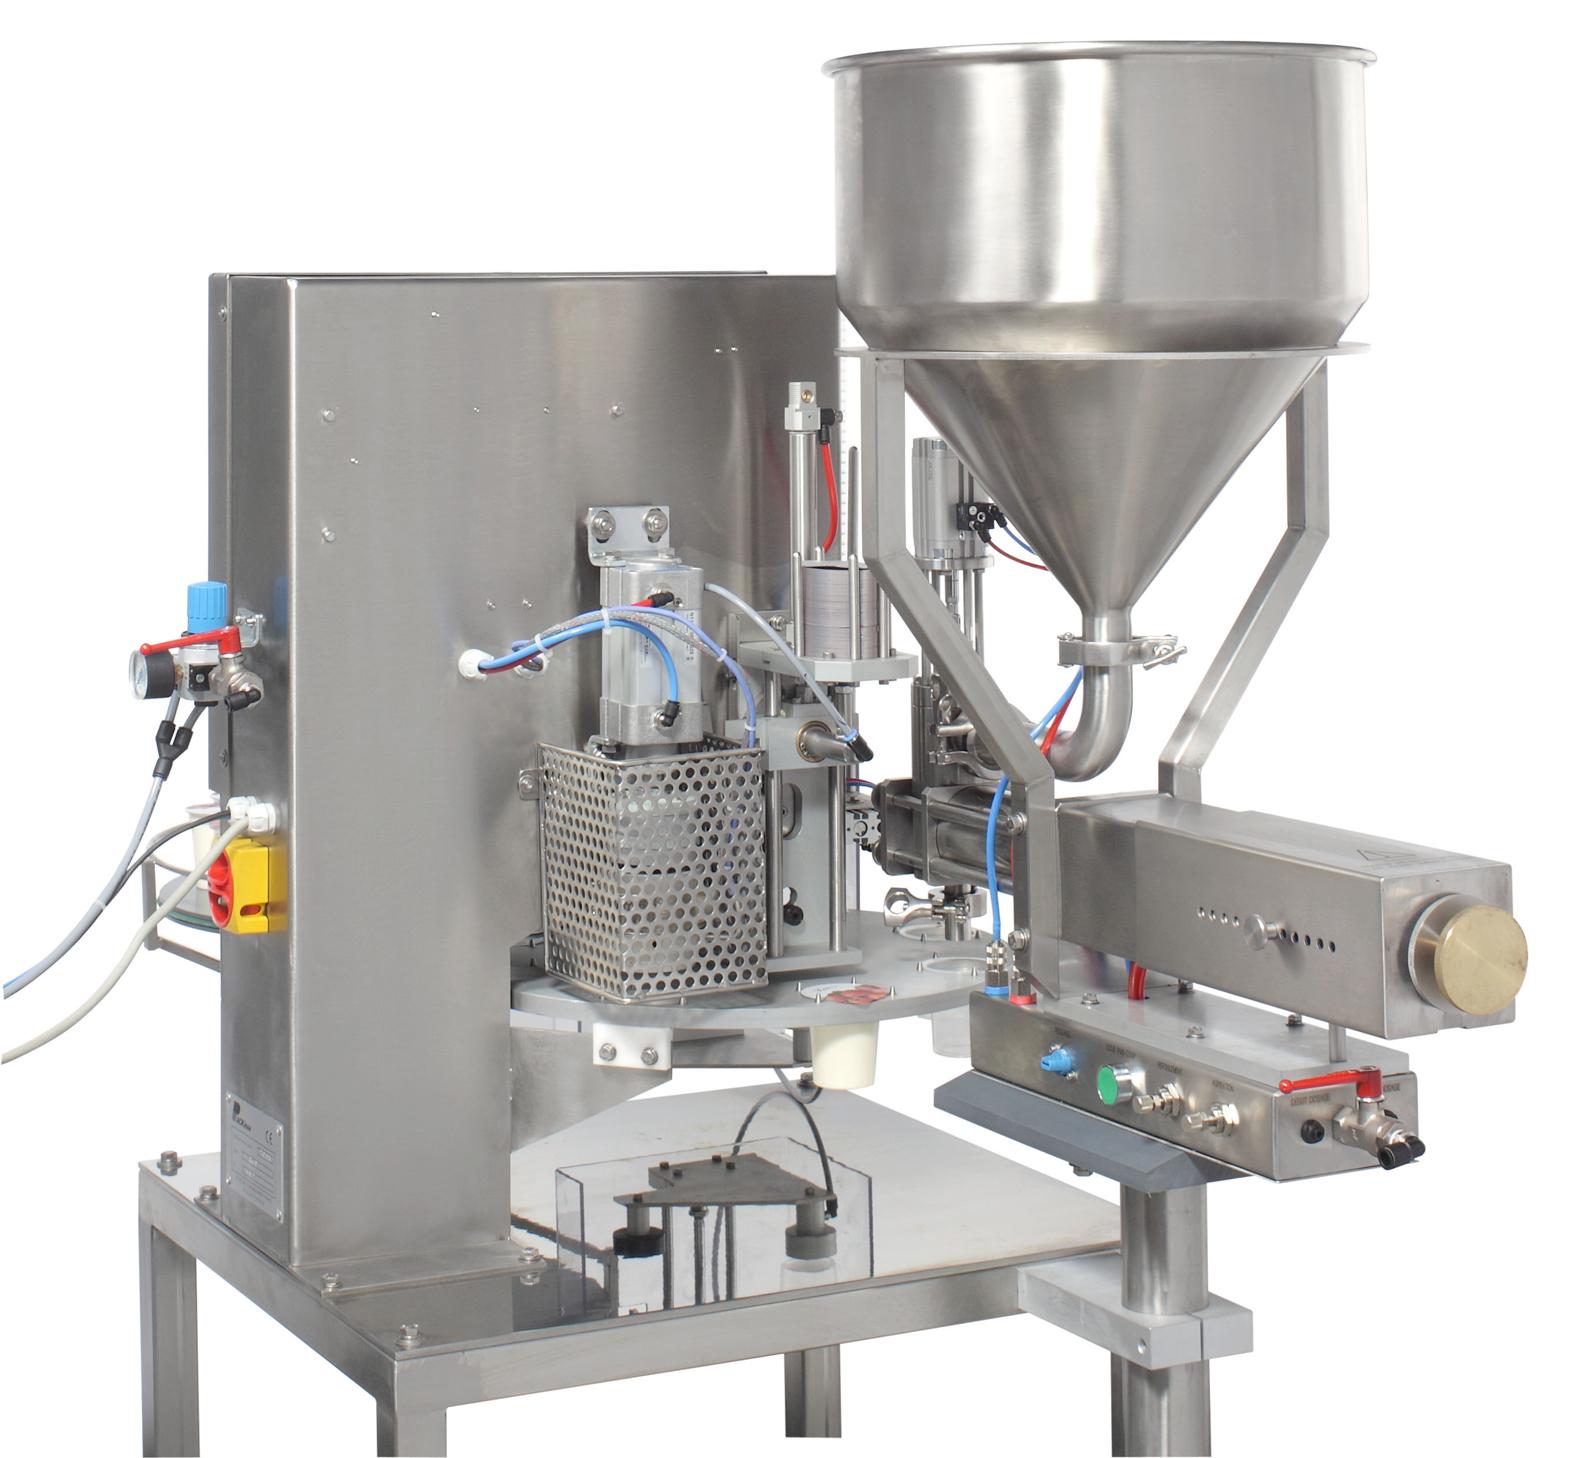 Conditionneuse yaourts packinov en stock id al - Machine a yaourt seb ...